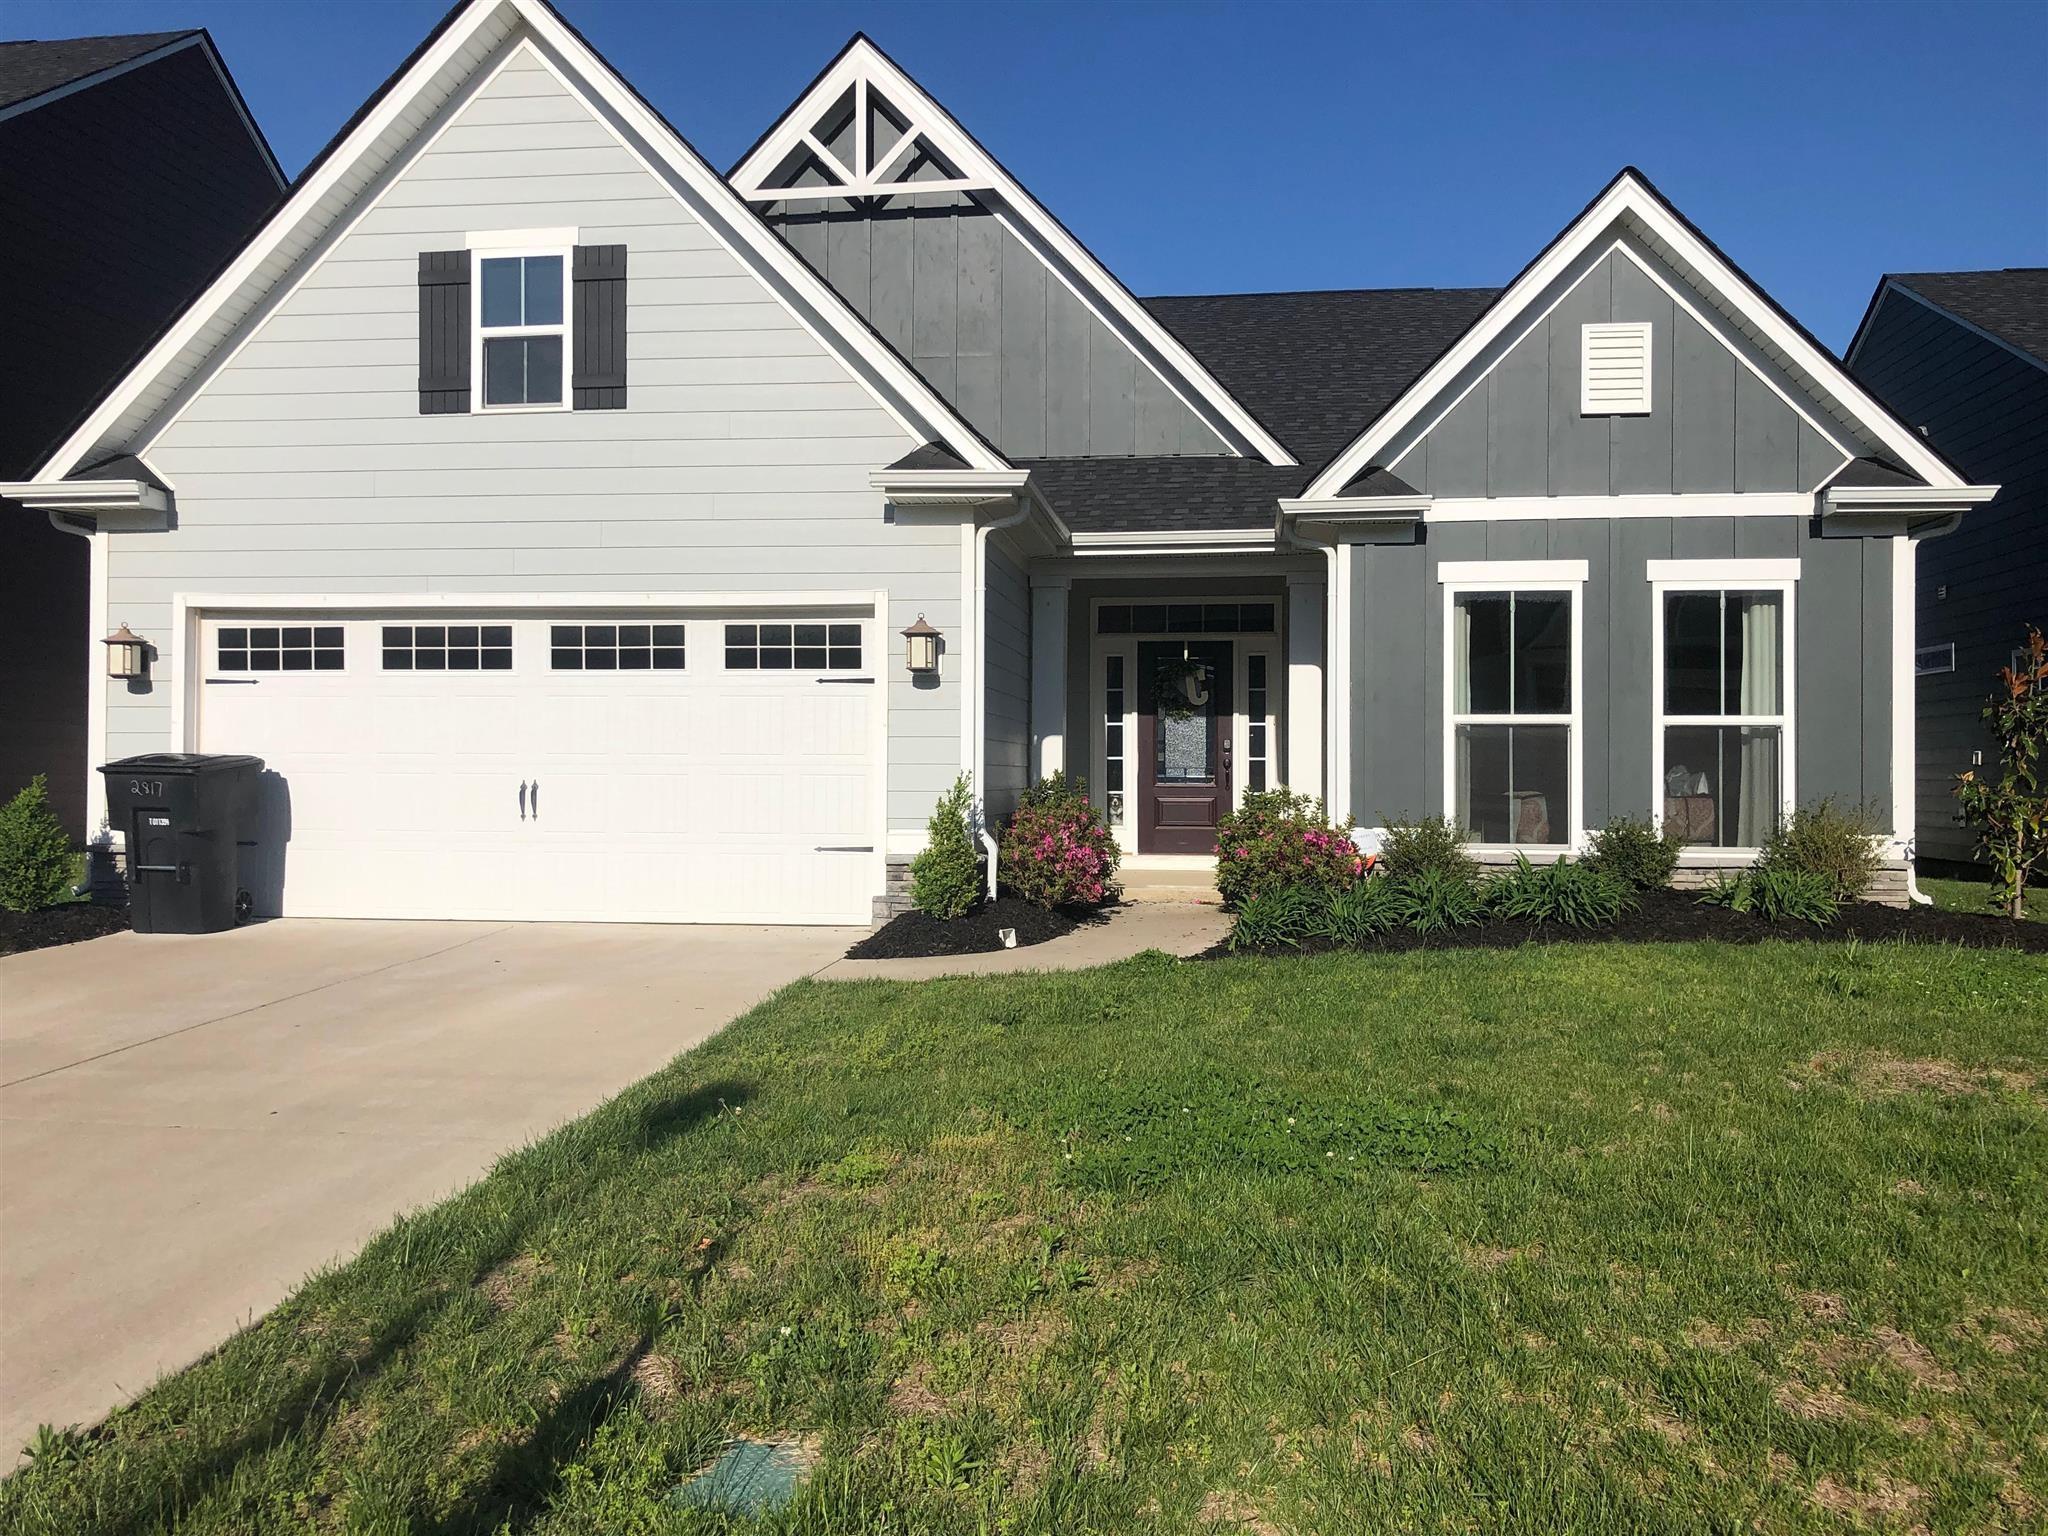 2817 Bluestem Ln Property Photo - Murfreesboro, TN real estate listing